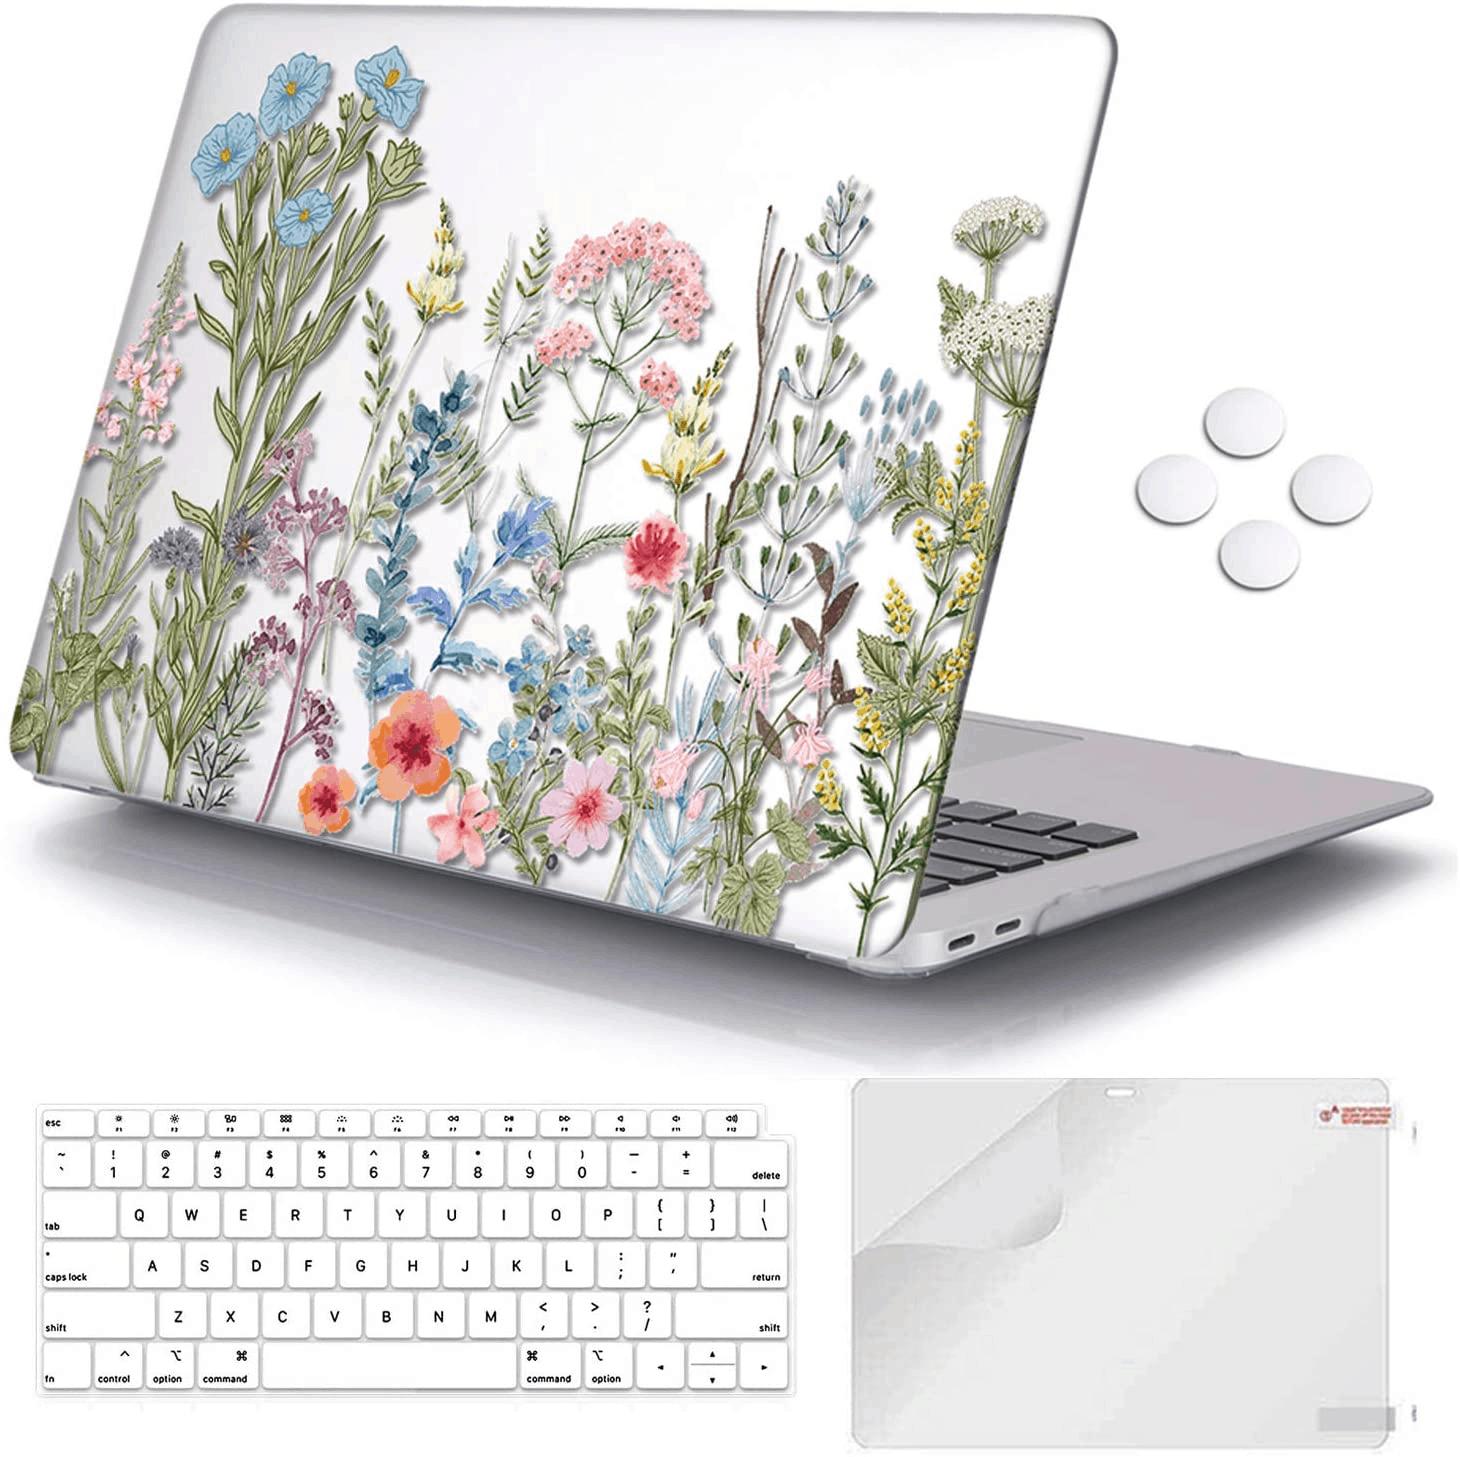 macbook air cases 13 inch